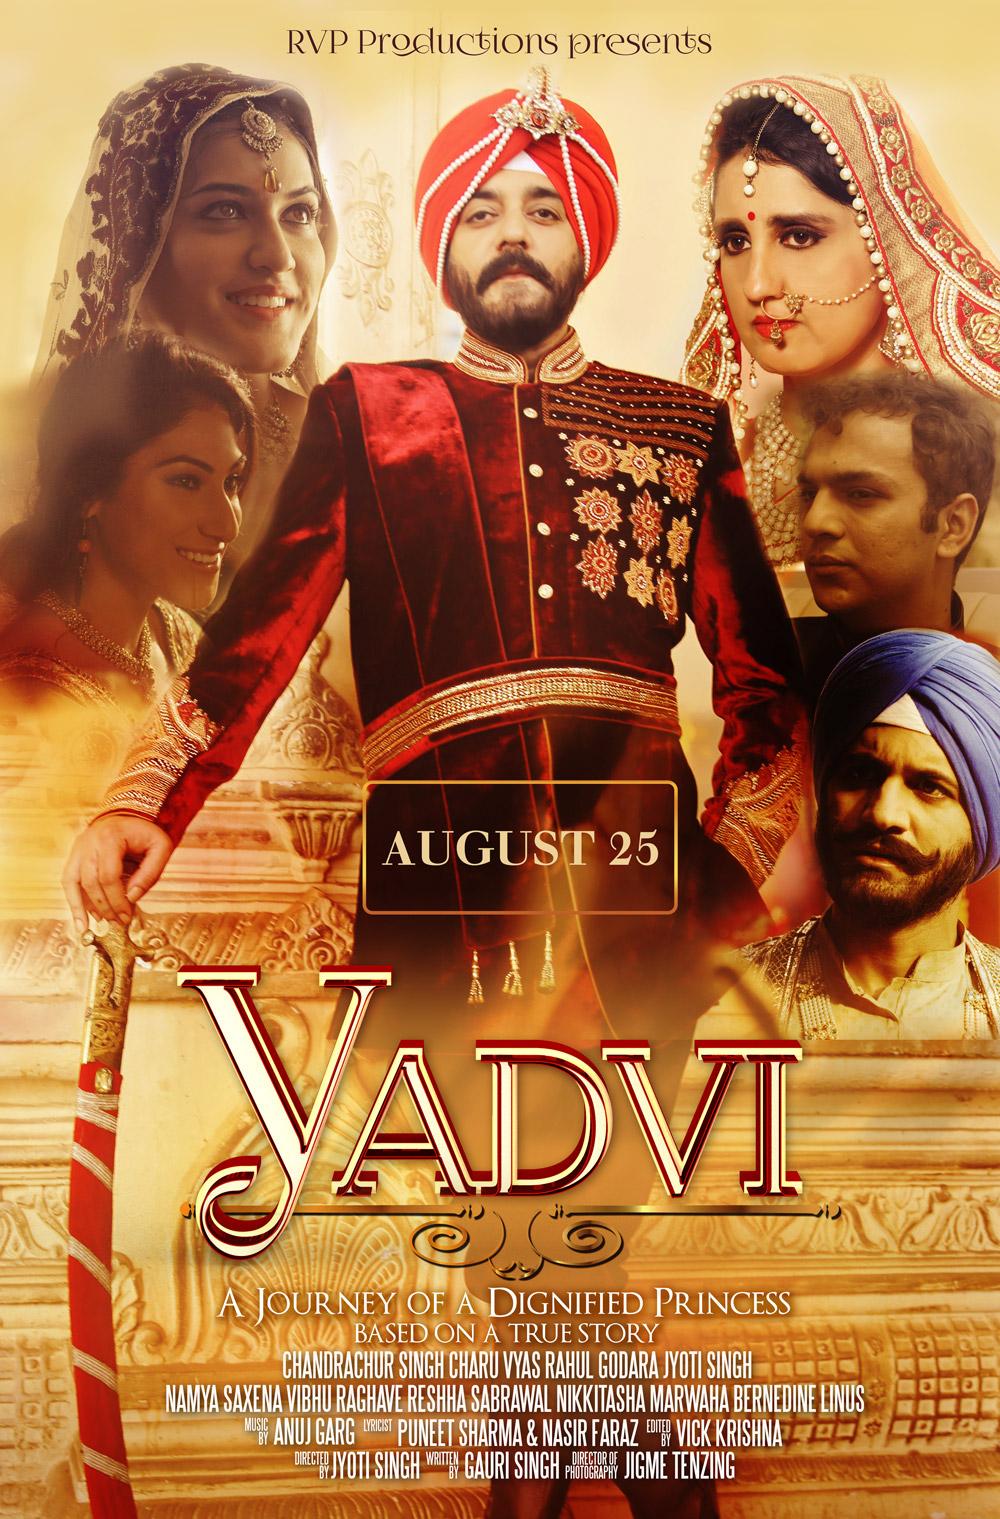 Director Jyoti Singh Speaks About Her Film Yadvi, a biopic on Princess Yadhuvansh Kumari of Patiala